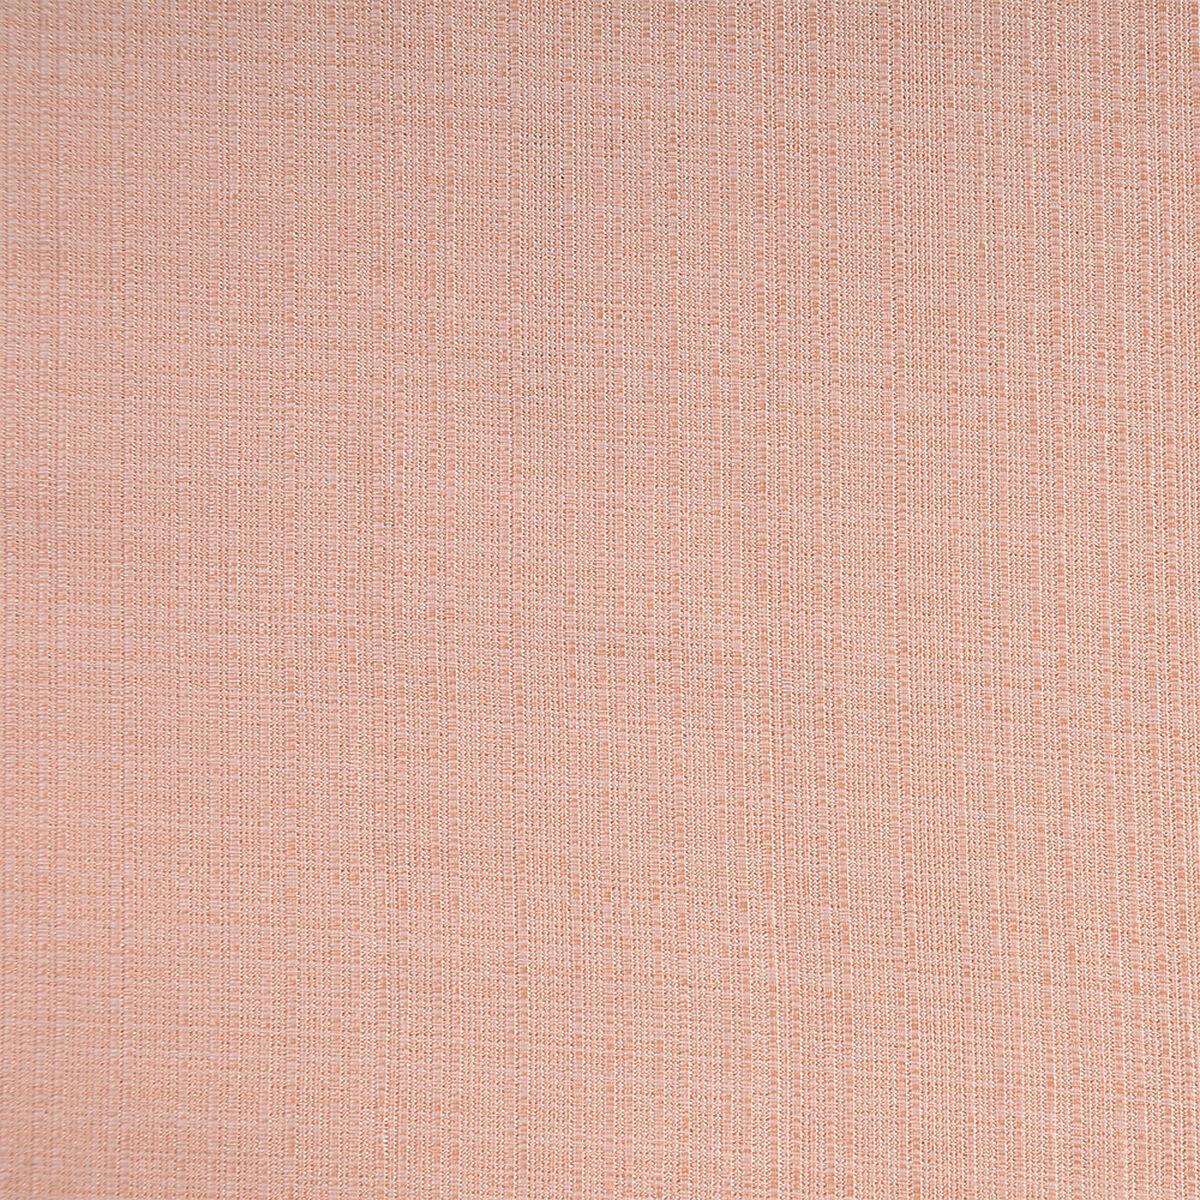 Set de Cortina Jacquard 140x220 cm